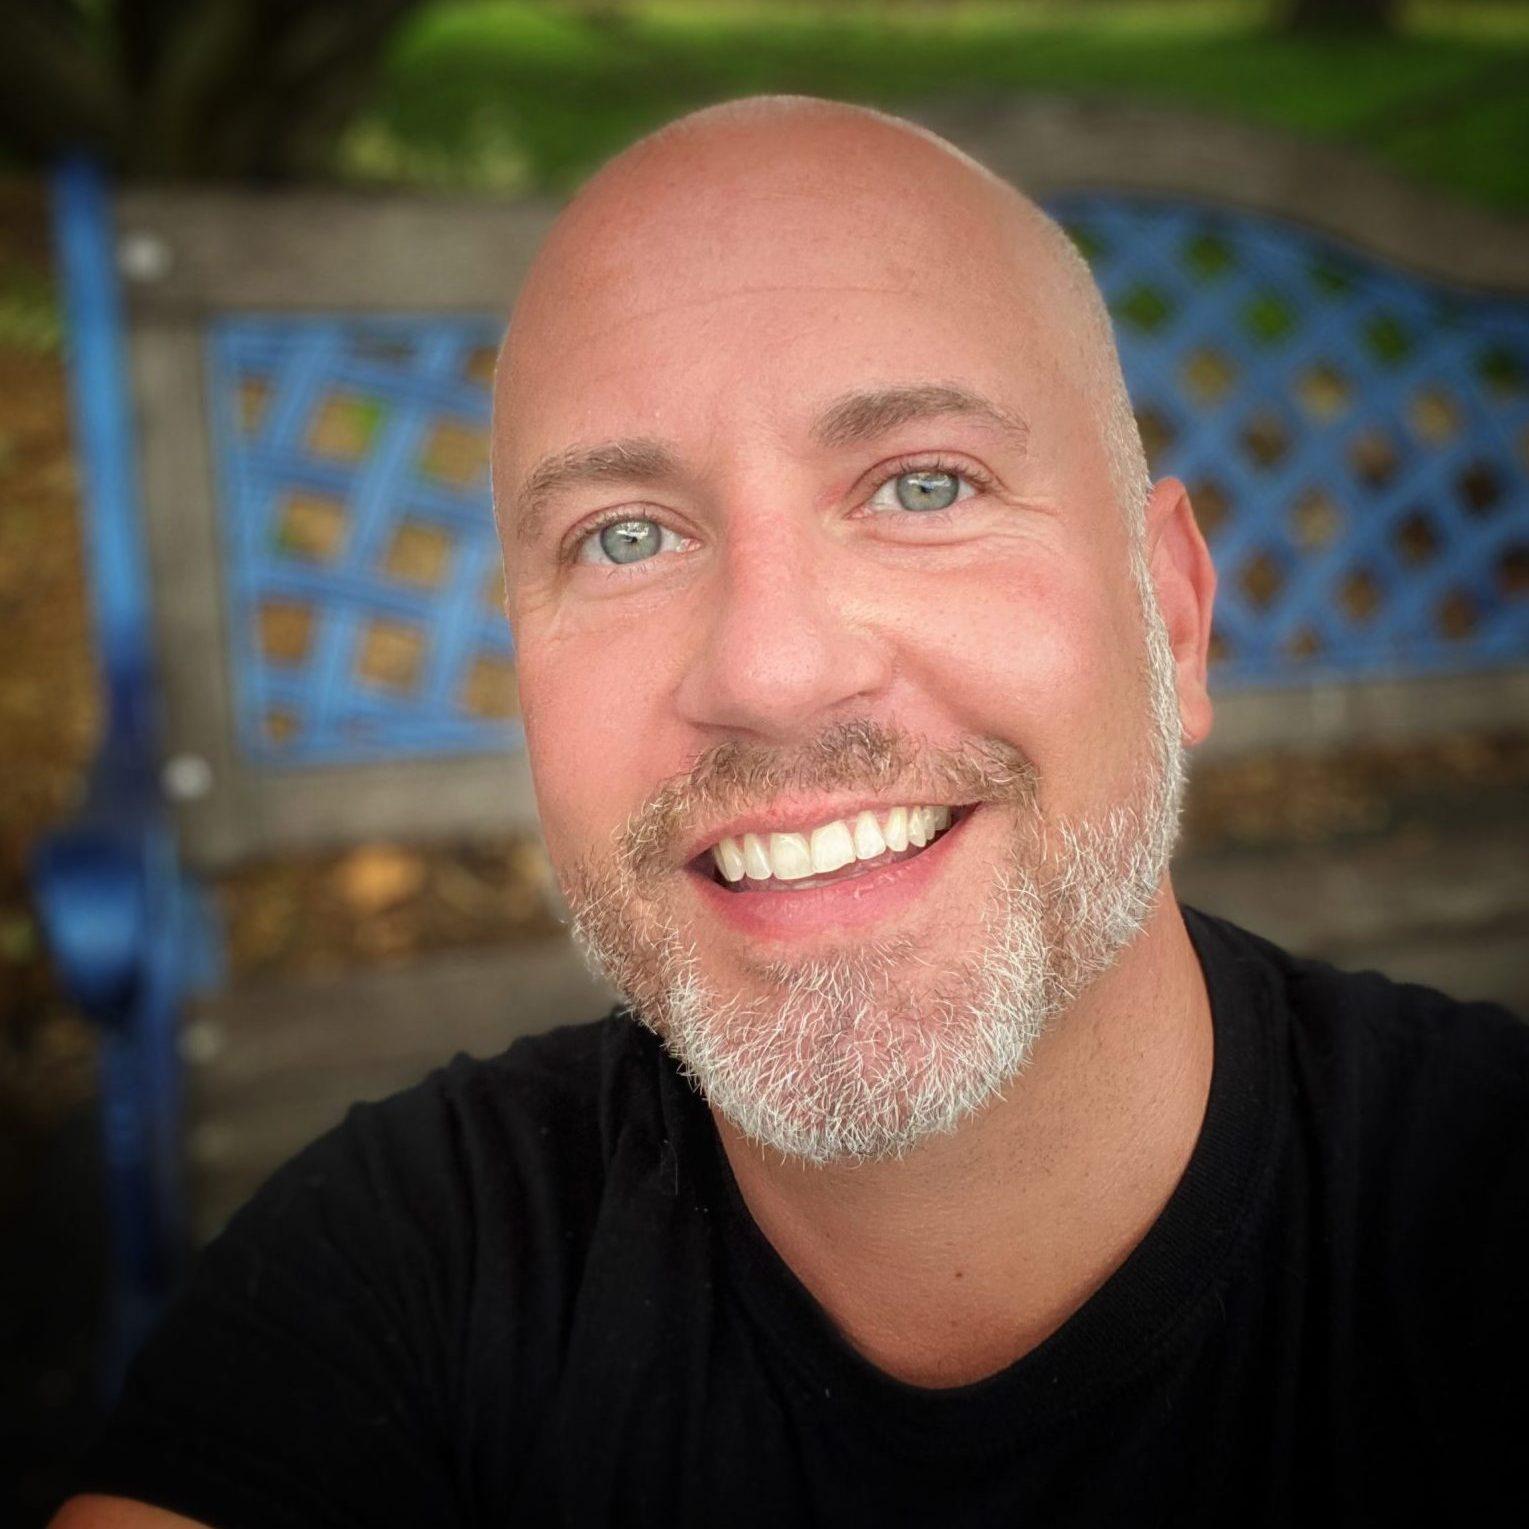 Matt shares his HIV diagnosis